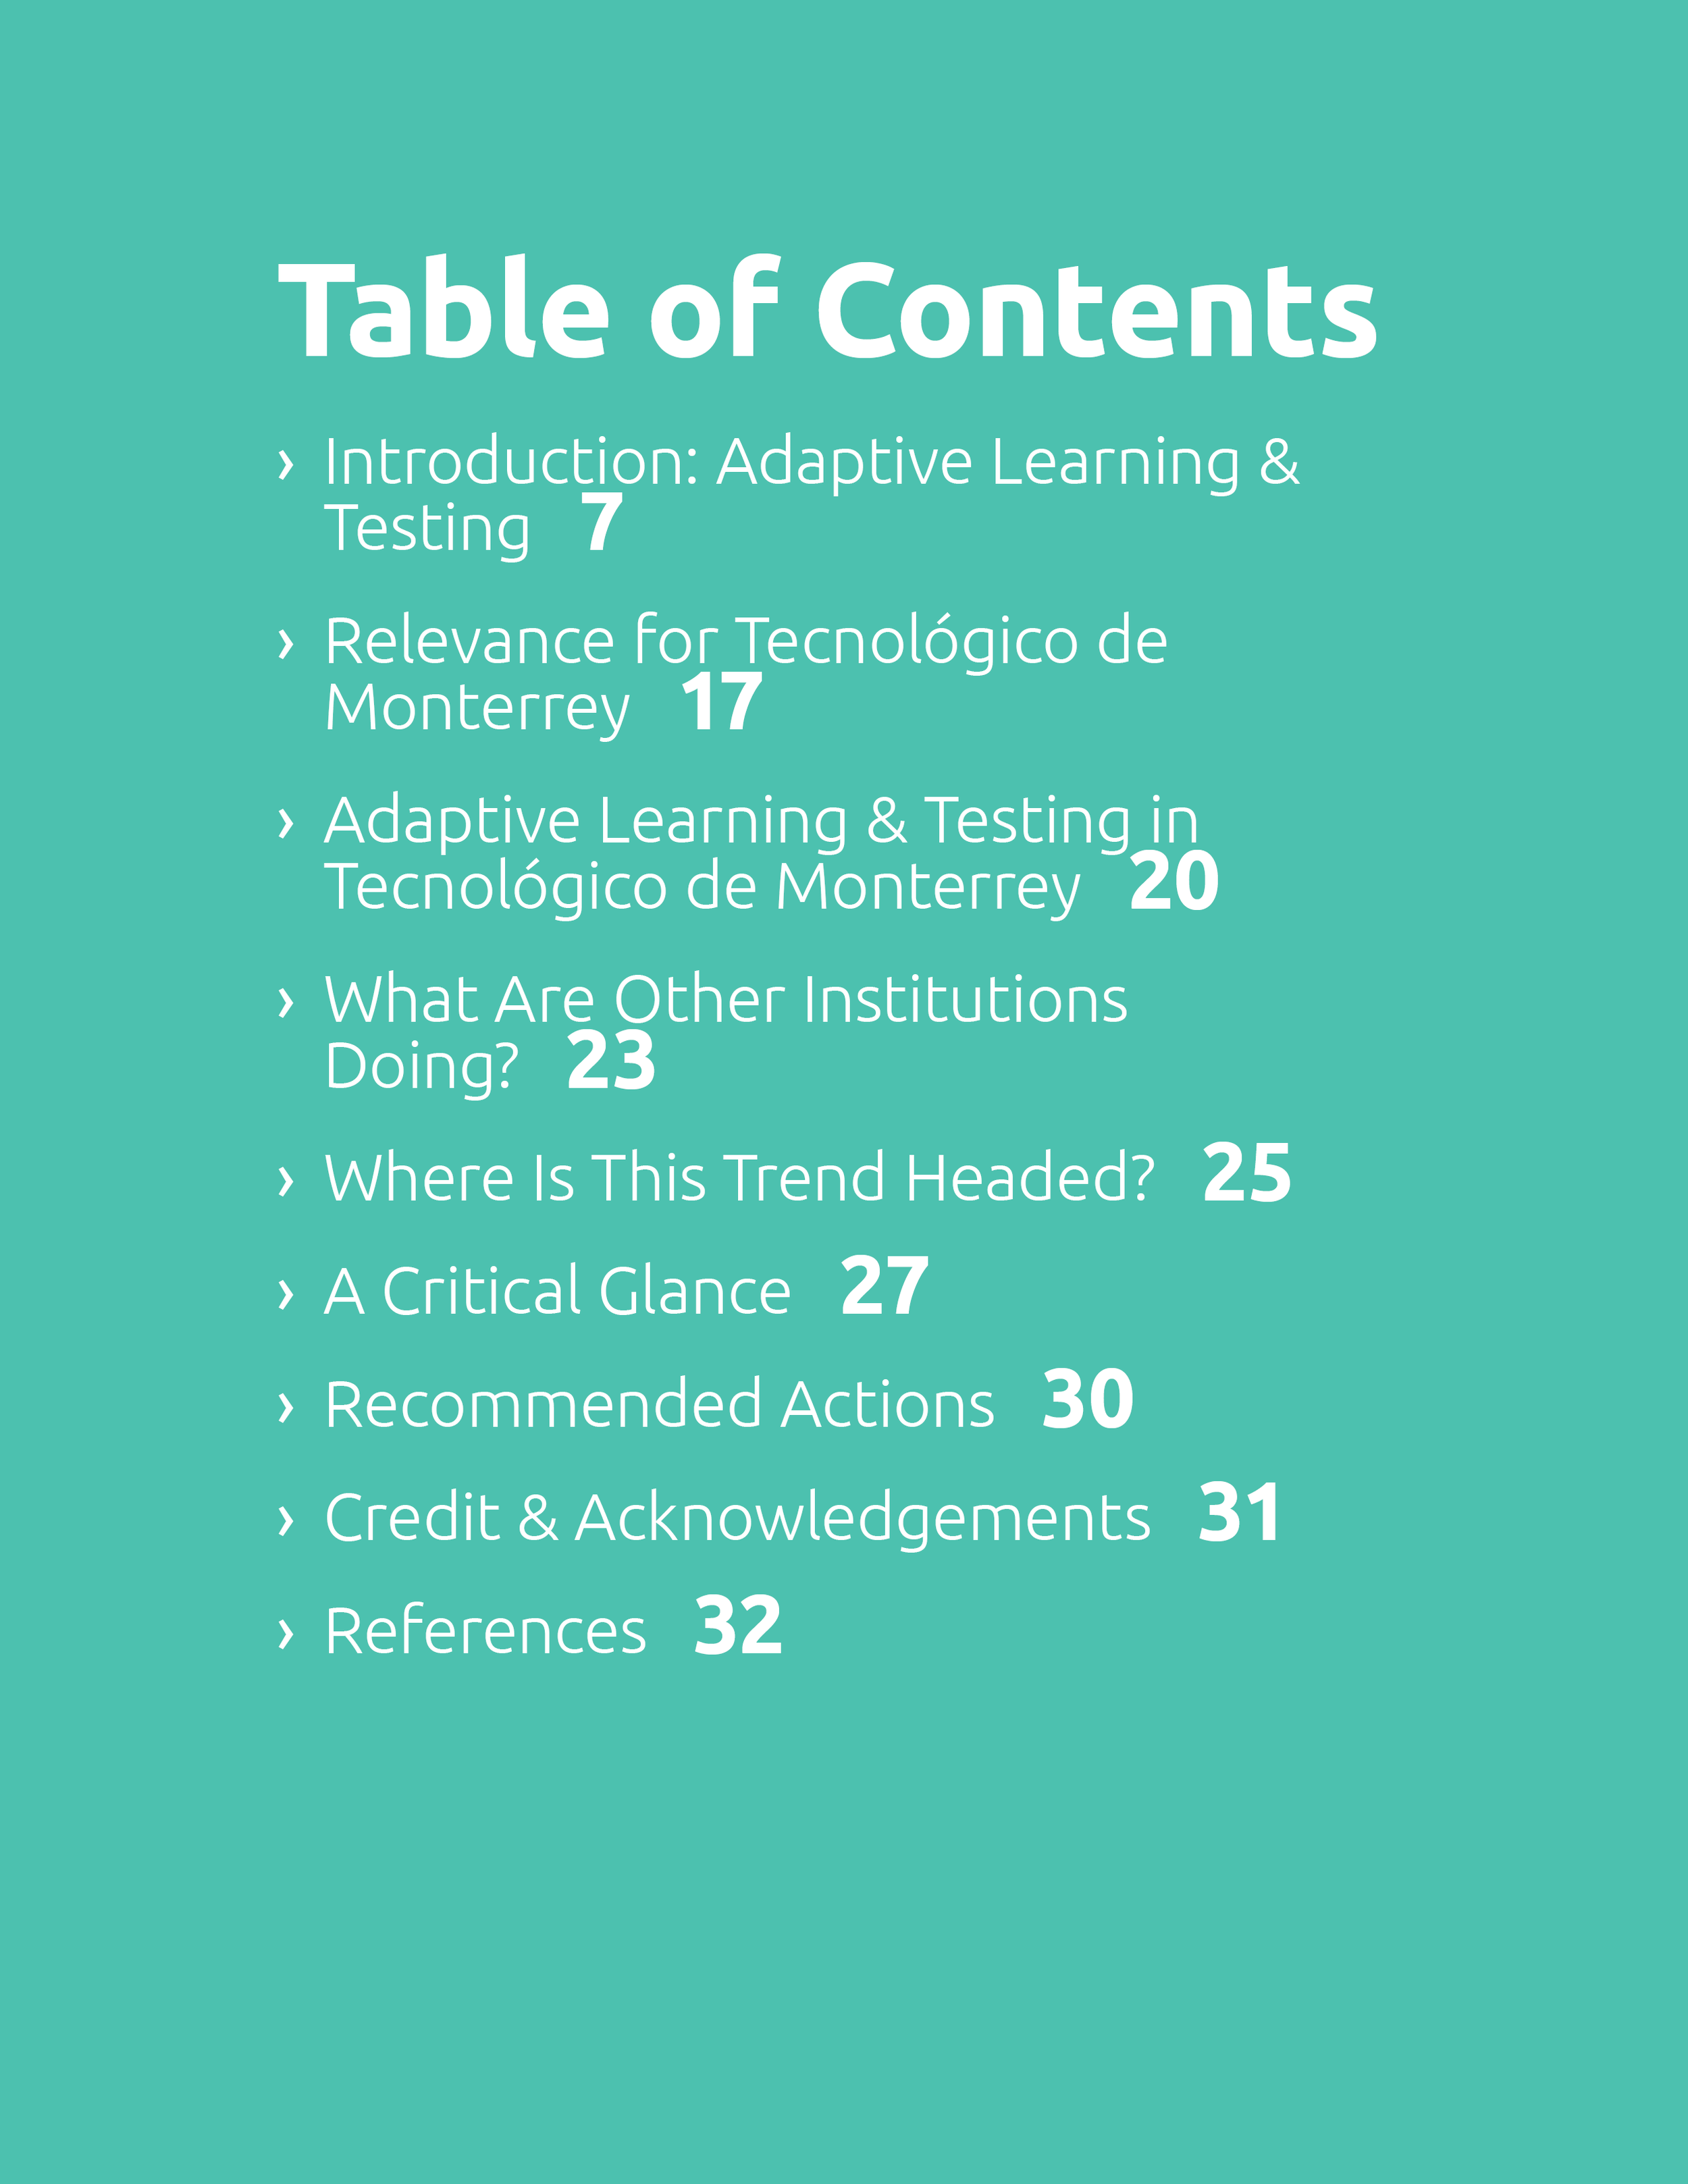 Edu Trends Adaptive - Profesores (eng-print)3.png